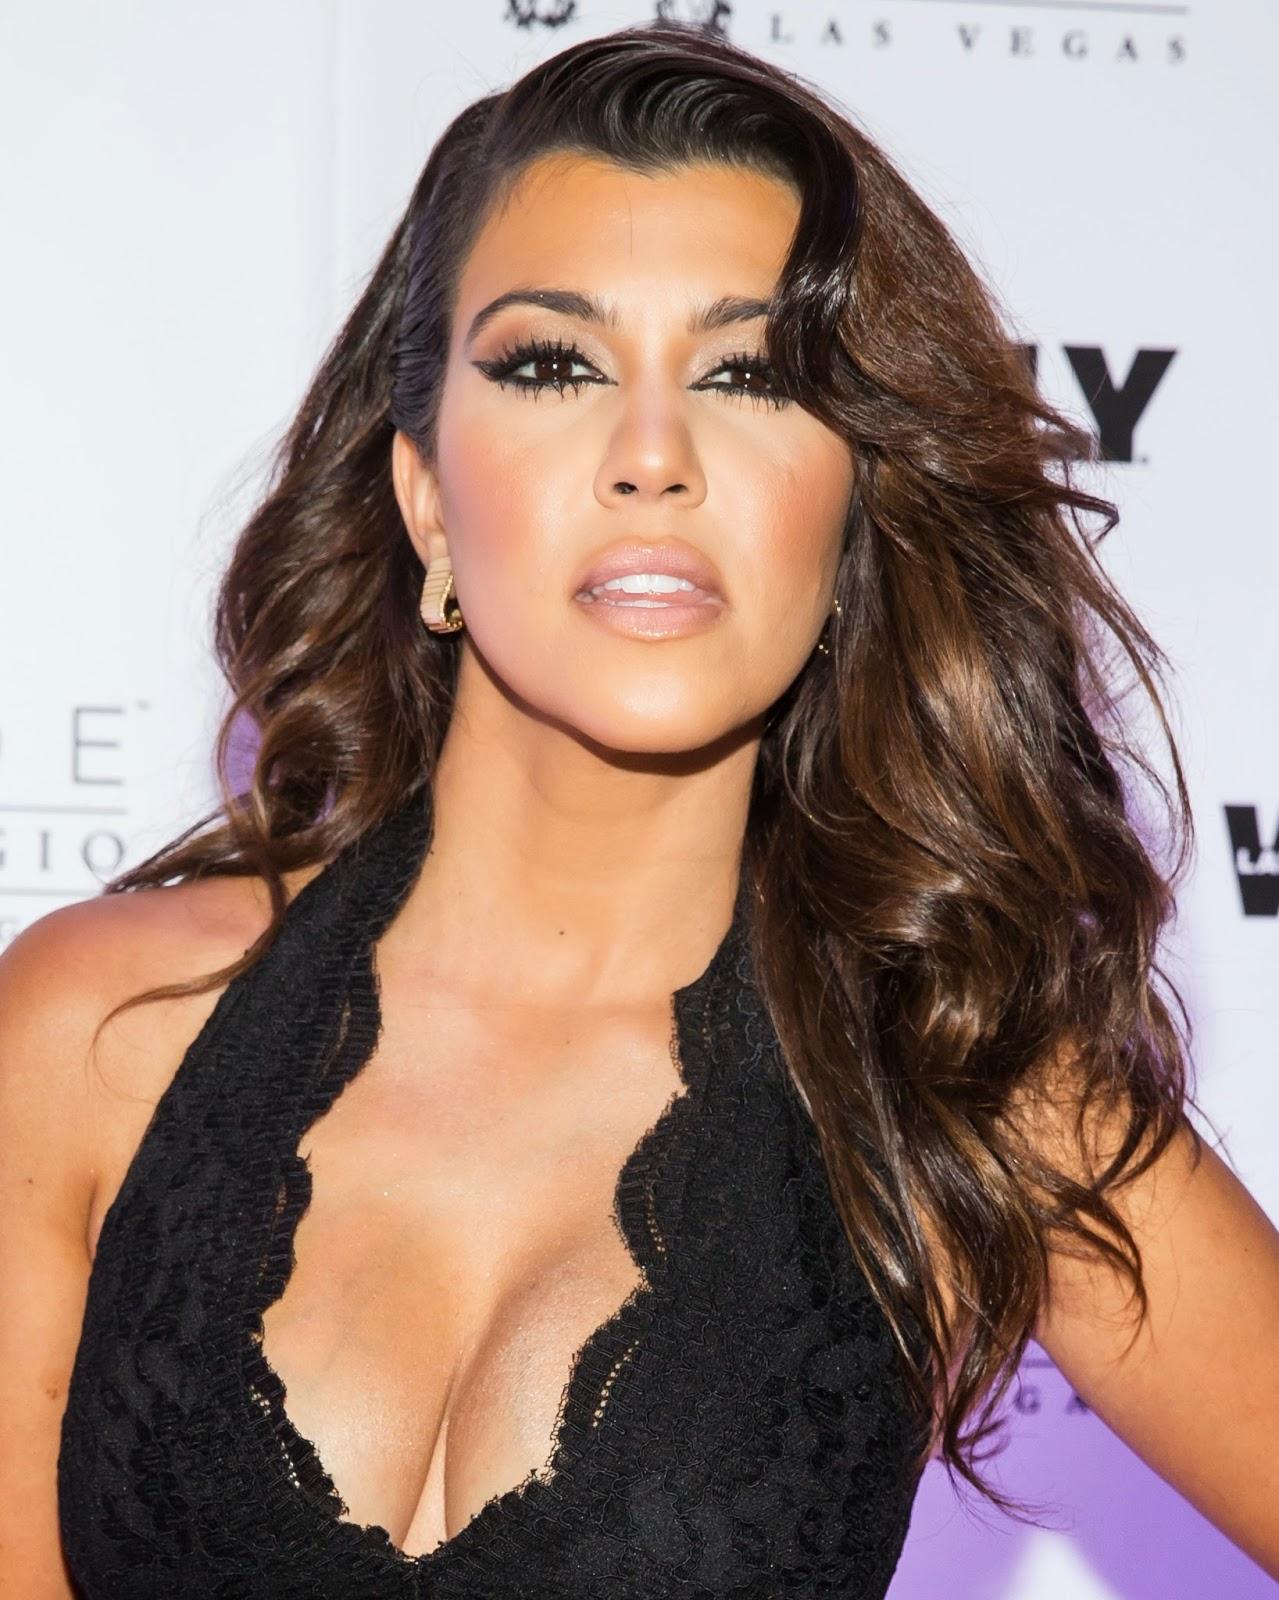 Ass Kourtney Mary Kardashian  nude (47 images), iCloud, braless